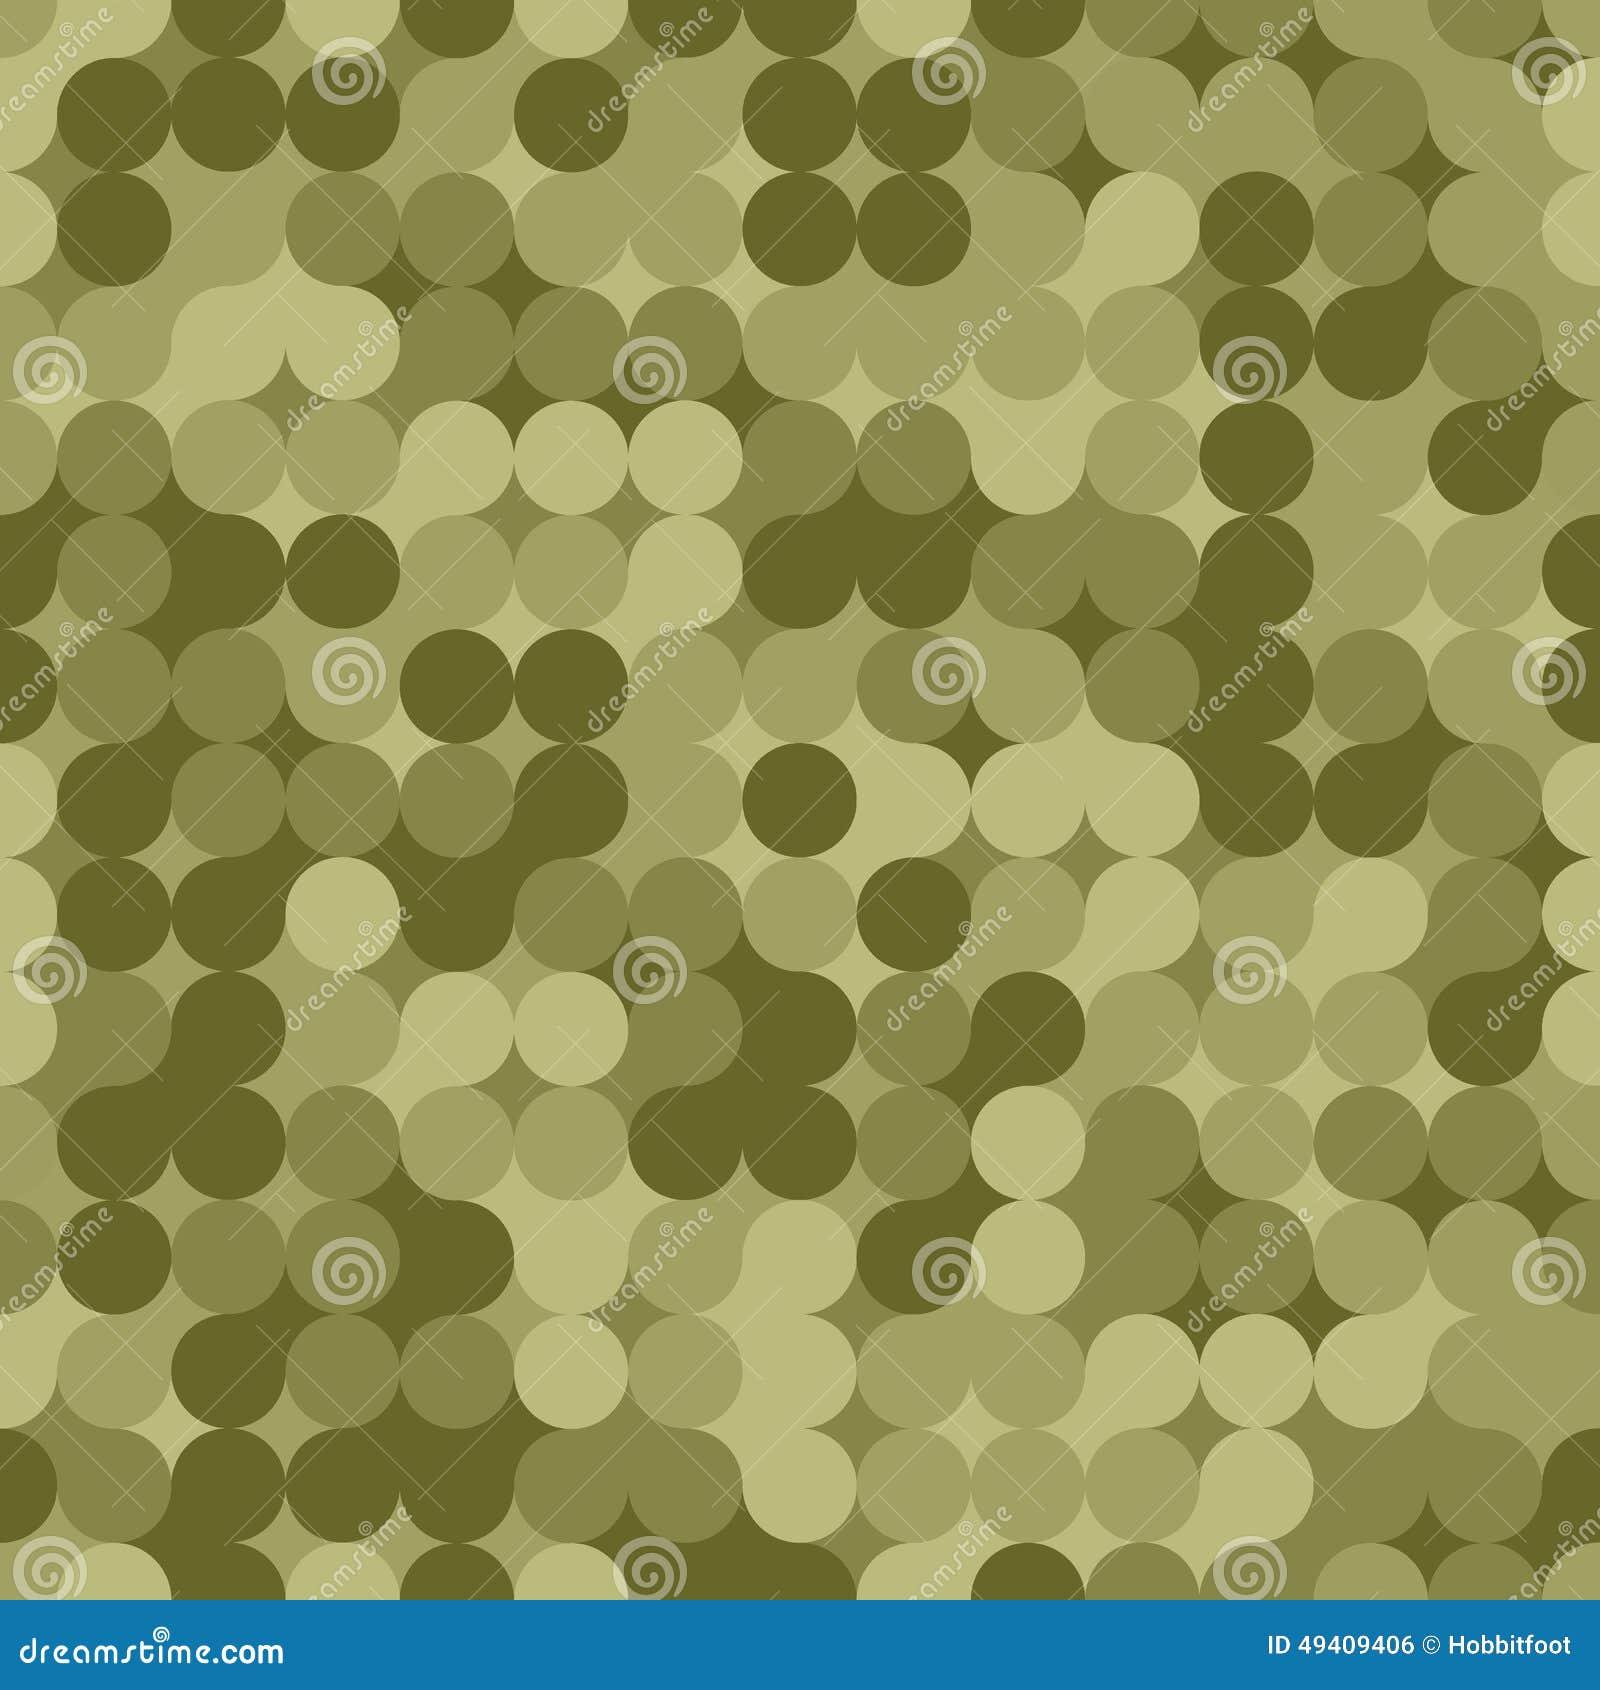 Download Nahtloses Muster Der Modernen Tarnung Vektor Vektor Abbildung - Illustration von material, auszug: 49409406